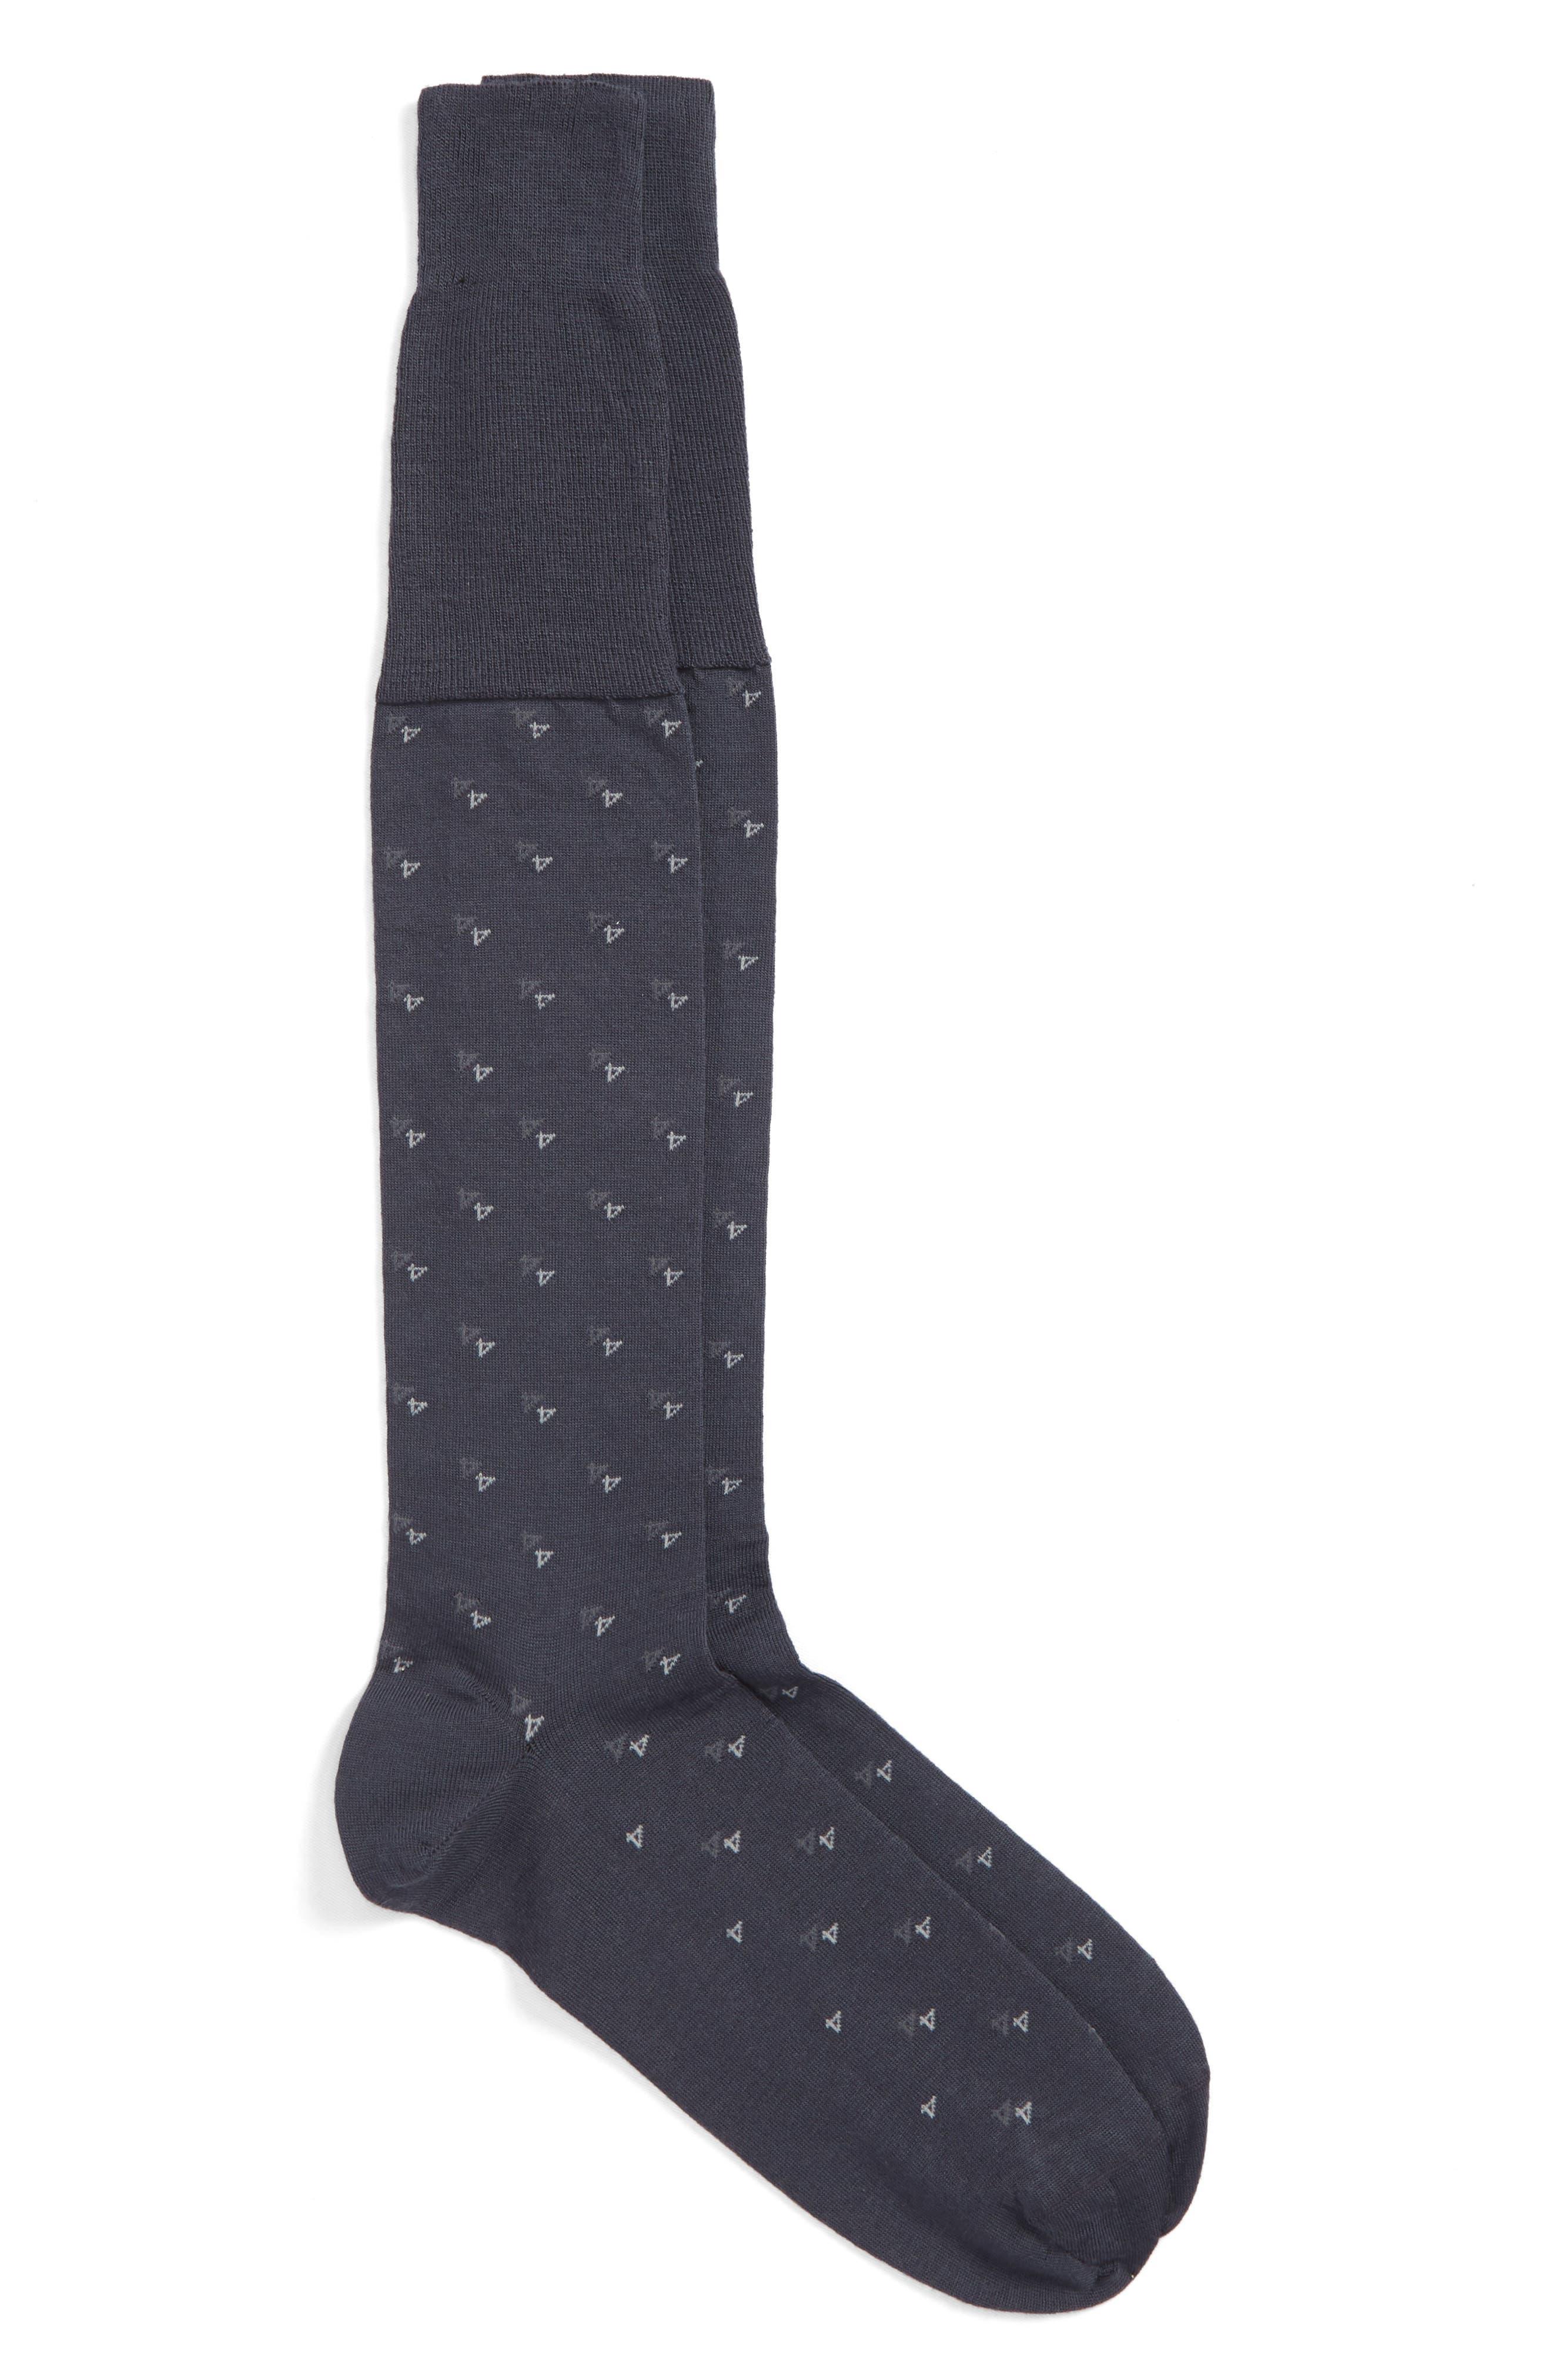 Geometric Over-the-Calf Socks,                             Main thumbnail 1, color,                             410